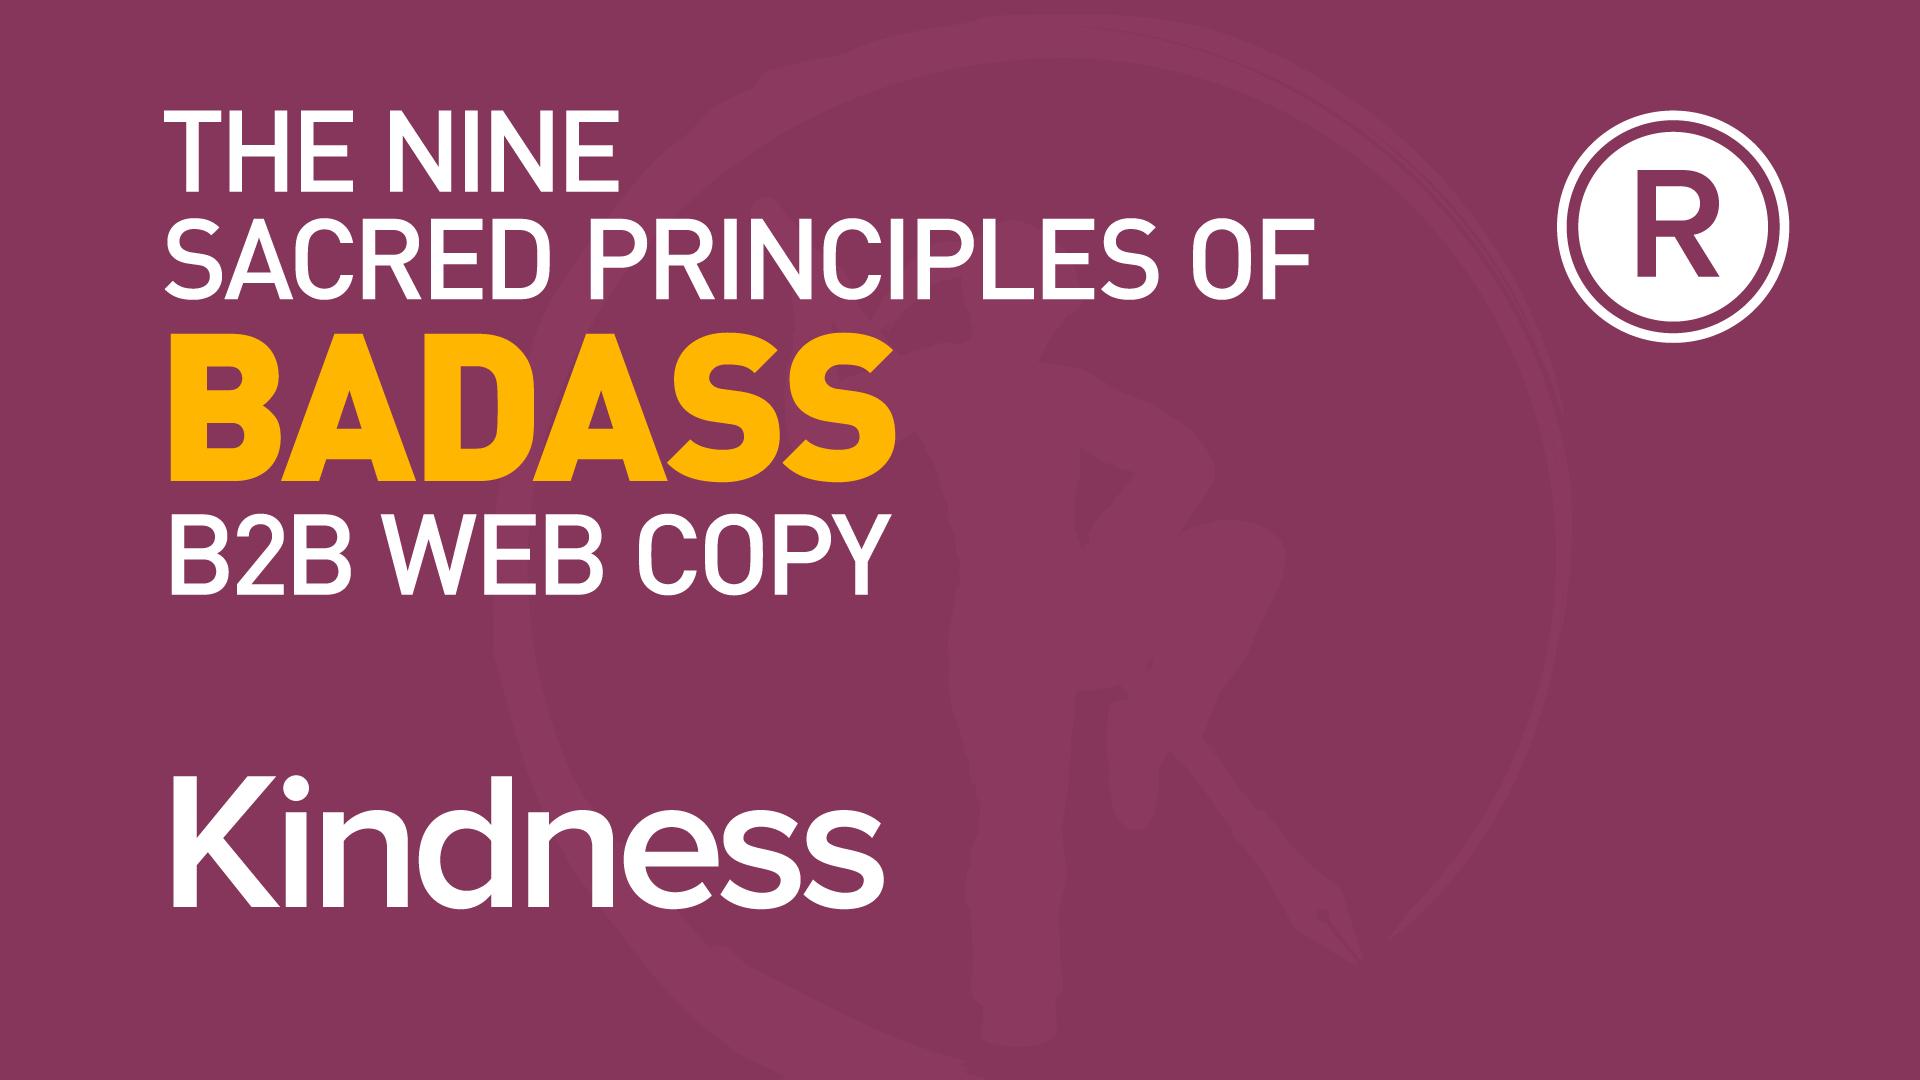 4th principle of badass B2B web copy: Kindness